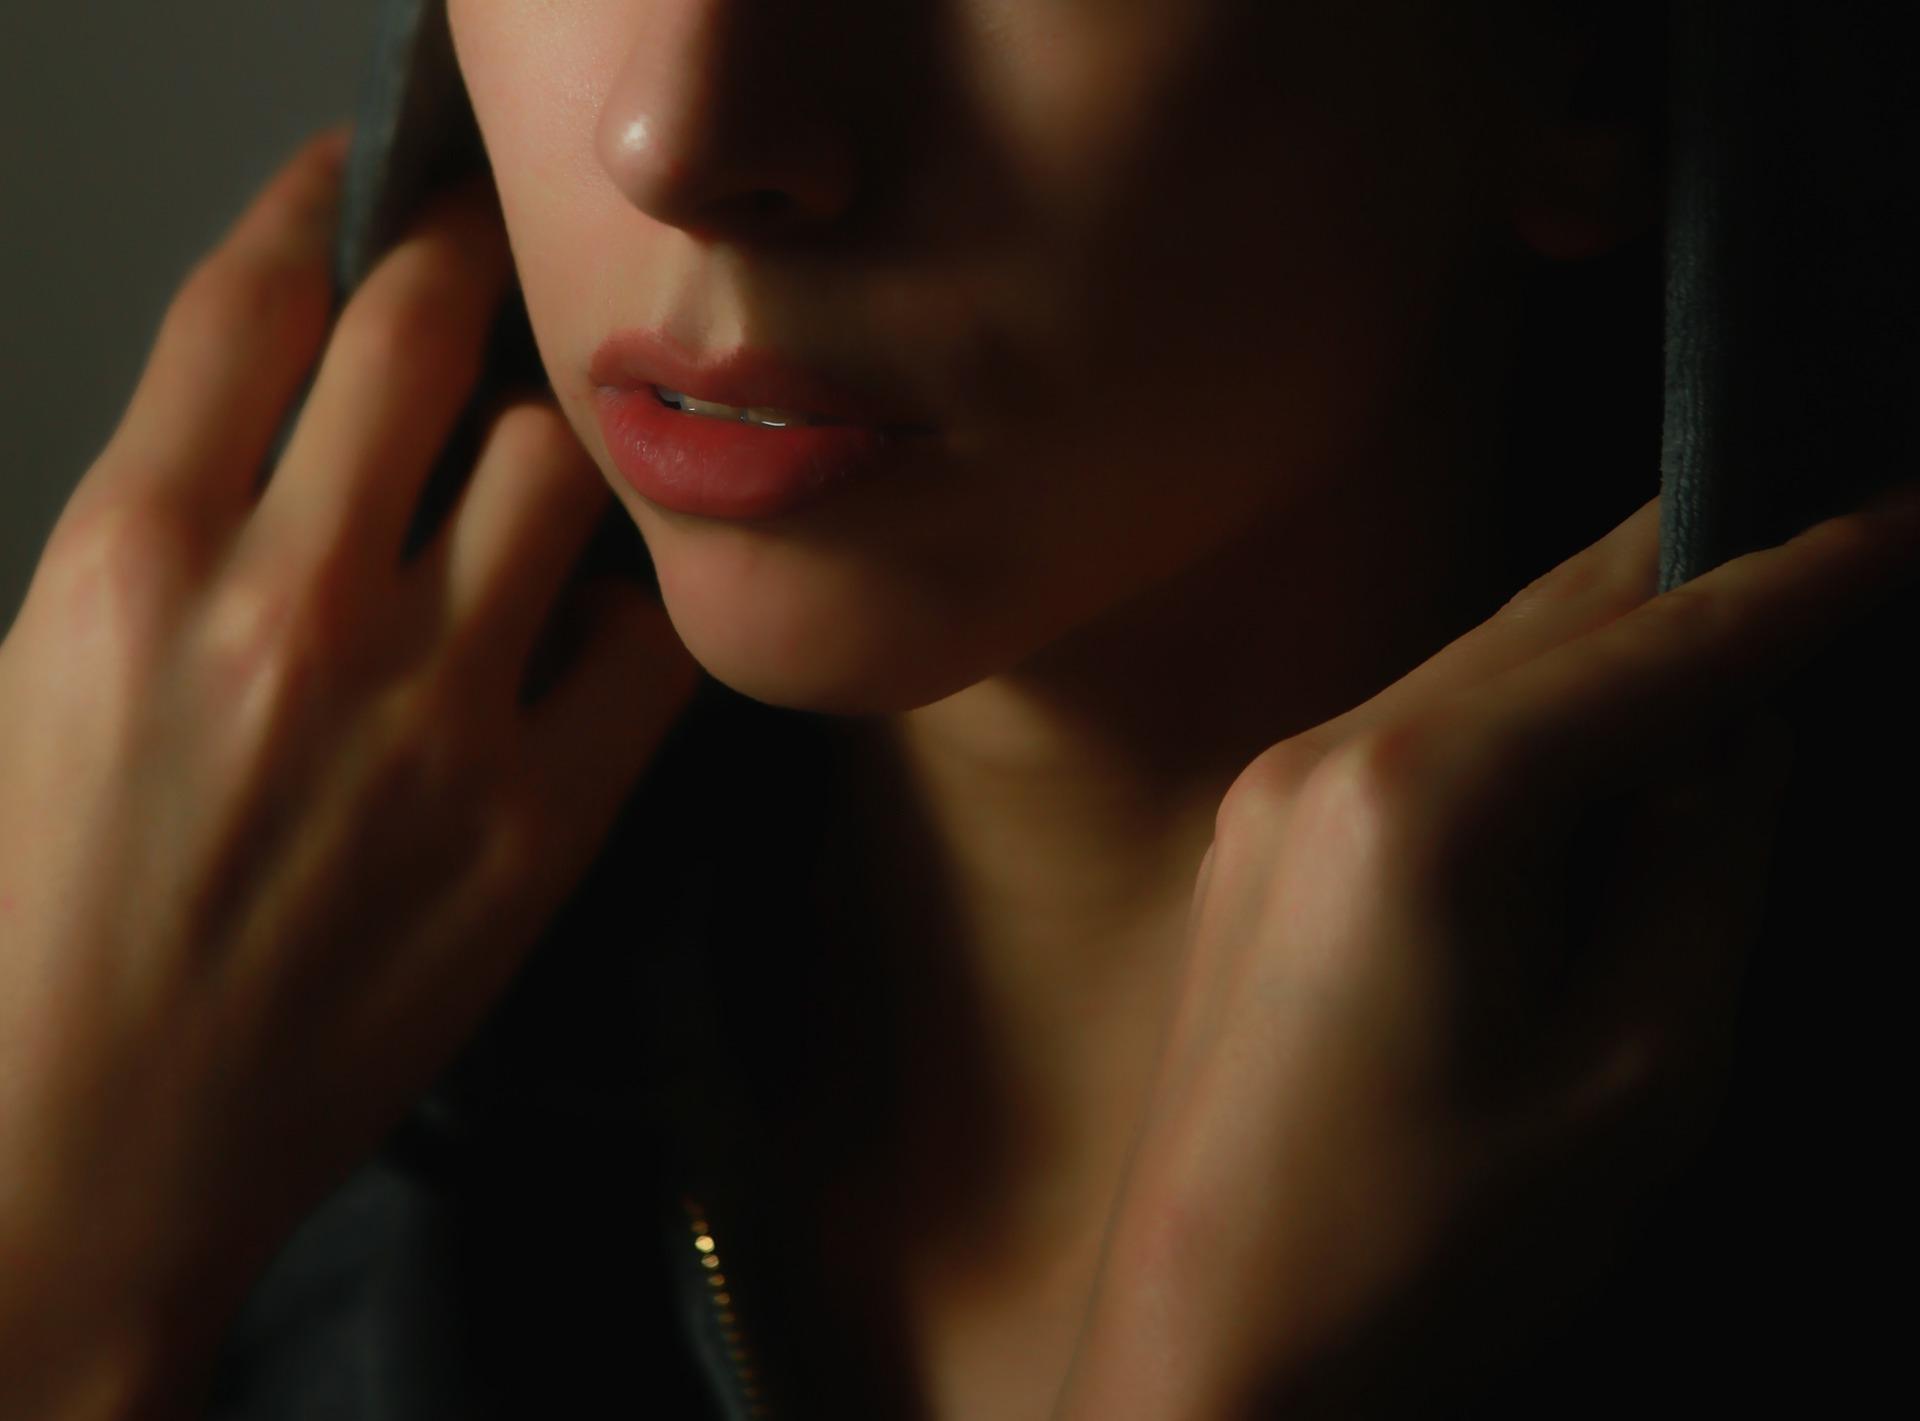 intrebari despre sex - sfatulparintilor.ro - pixabay_com - girl-2220315_1920